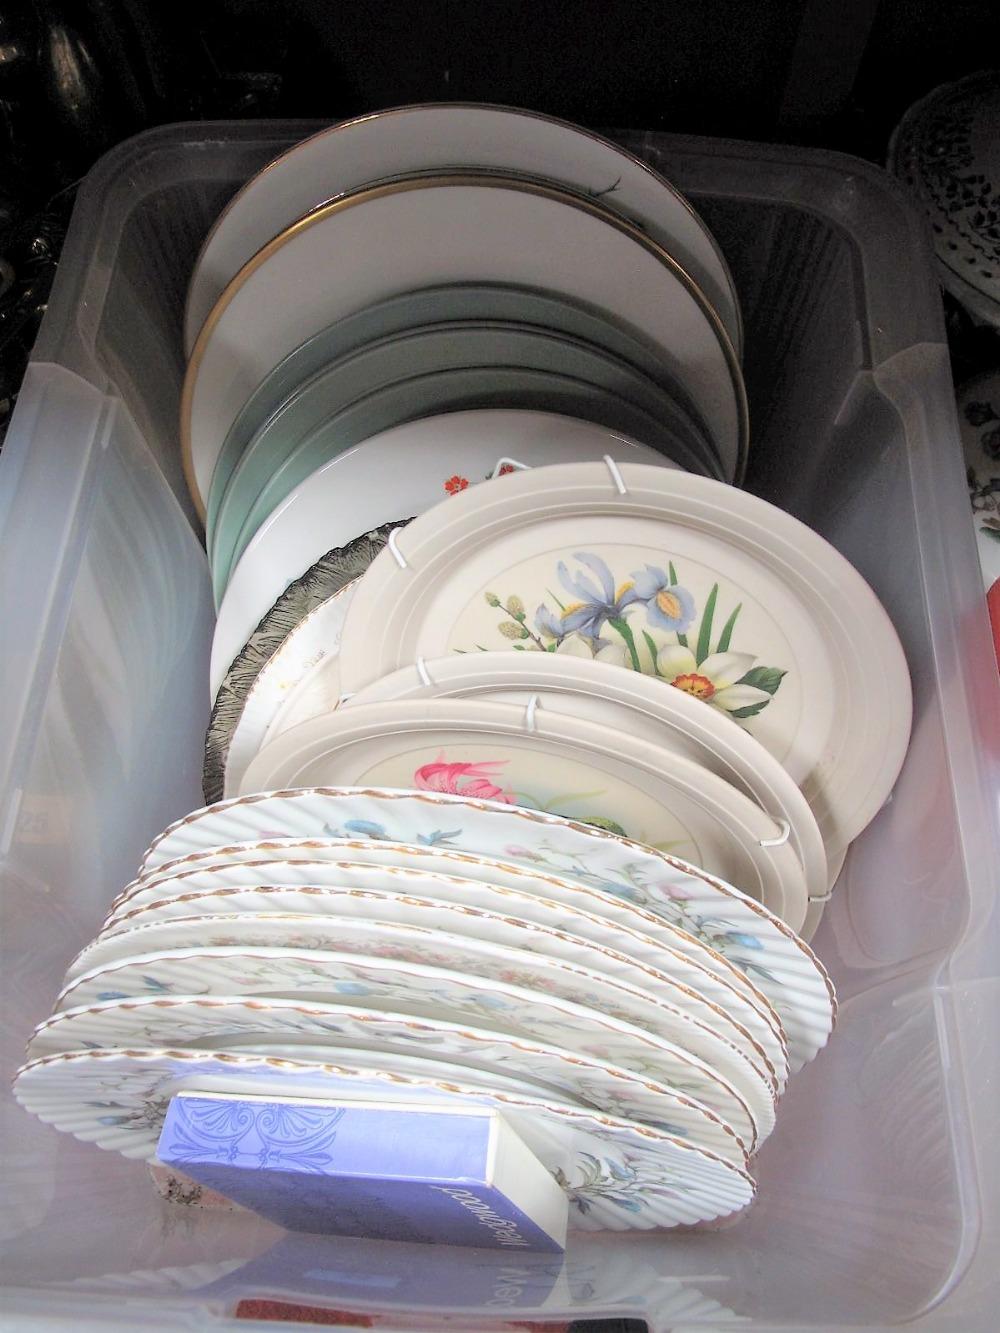 Lot 24 - Royal Albert 'Brigadoon' Dinner Plates, Coalport and others:- One Box